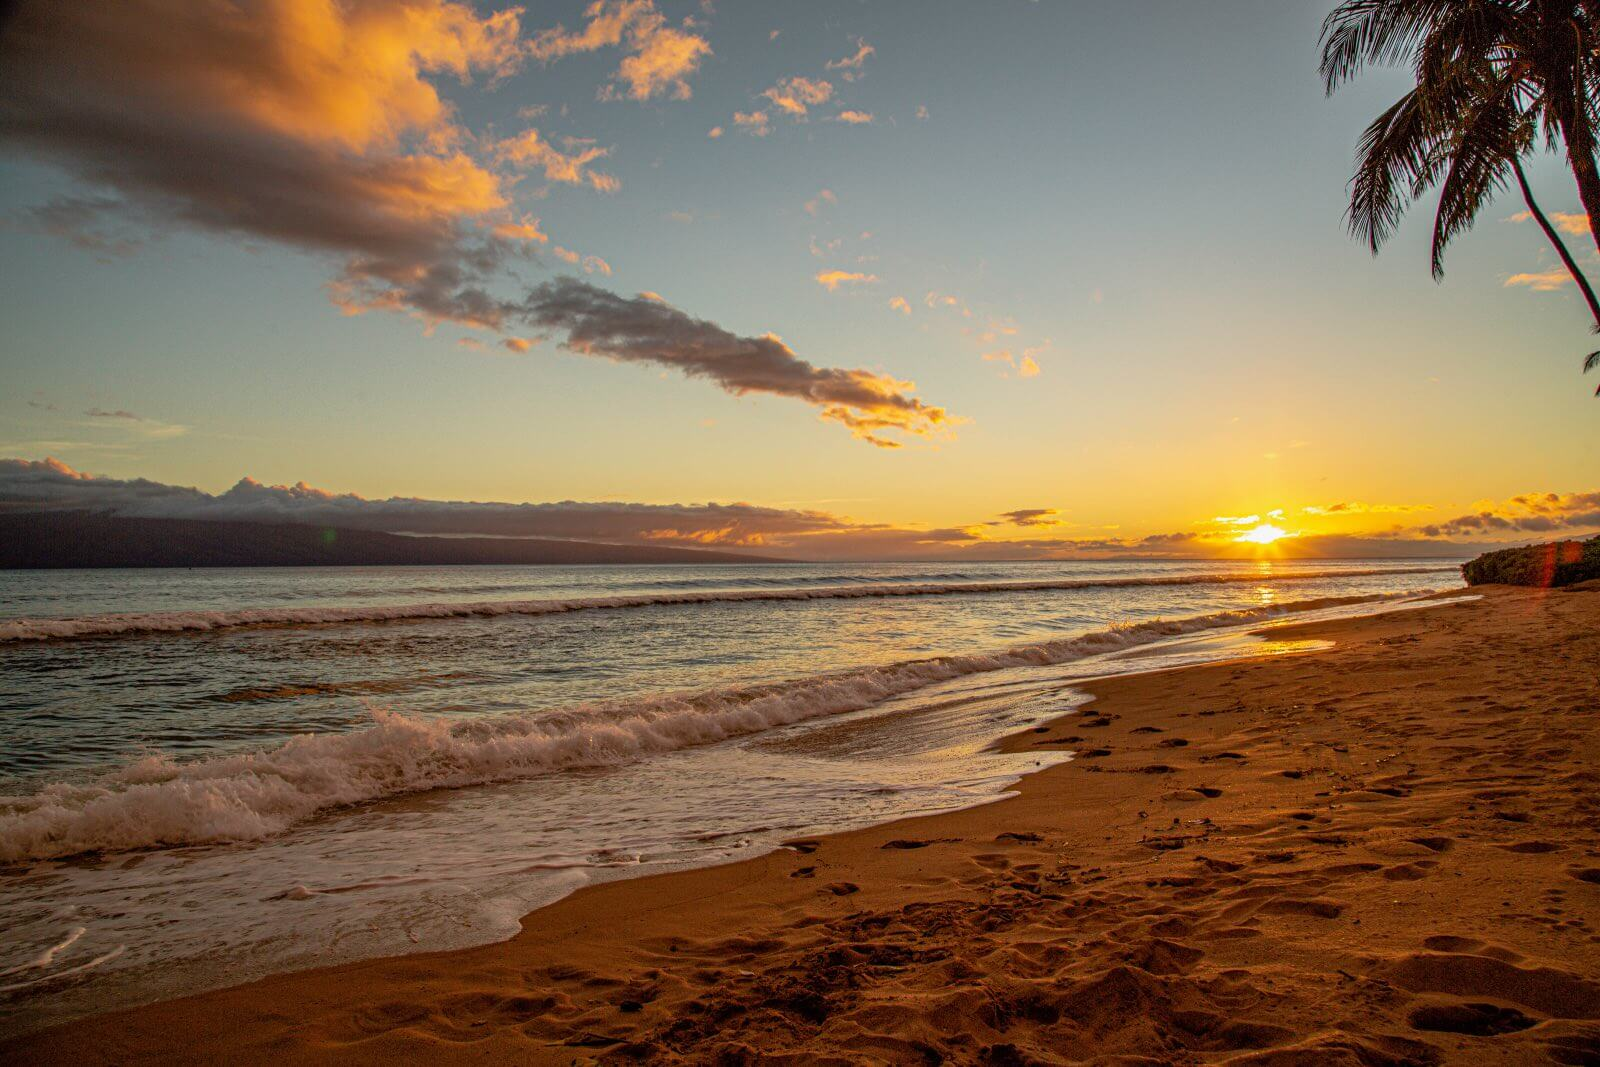 Sunset at Kaanapali Beach Maui with a palm tree